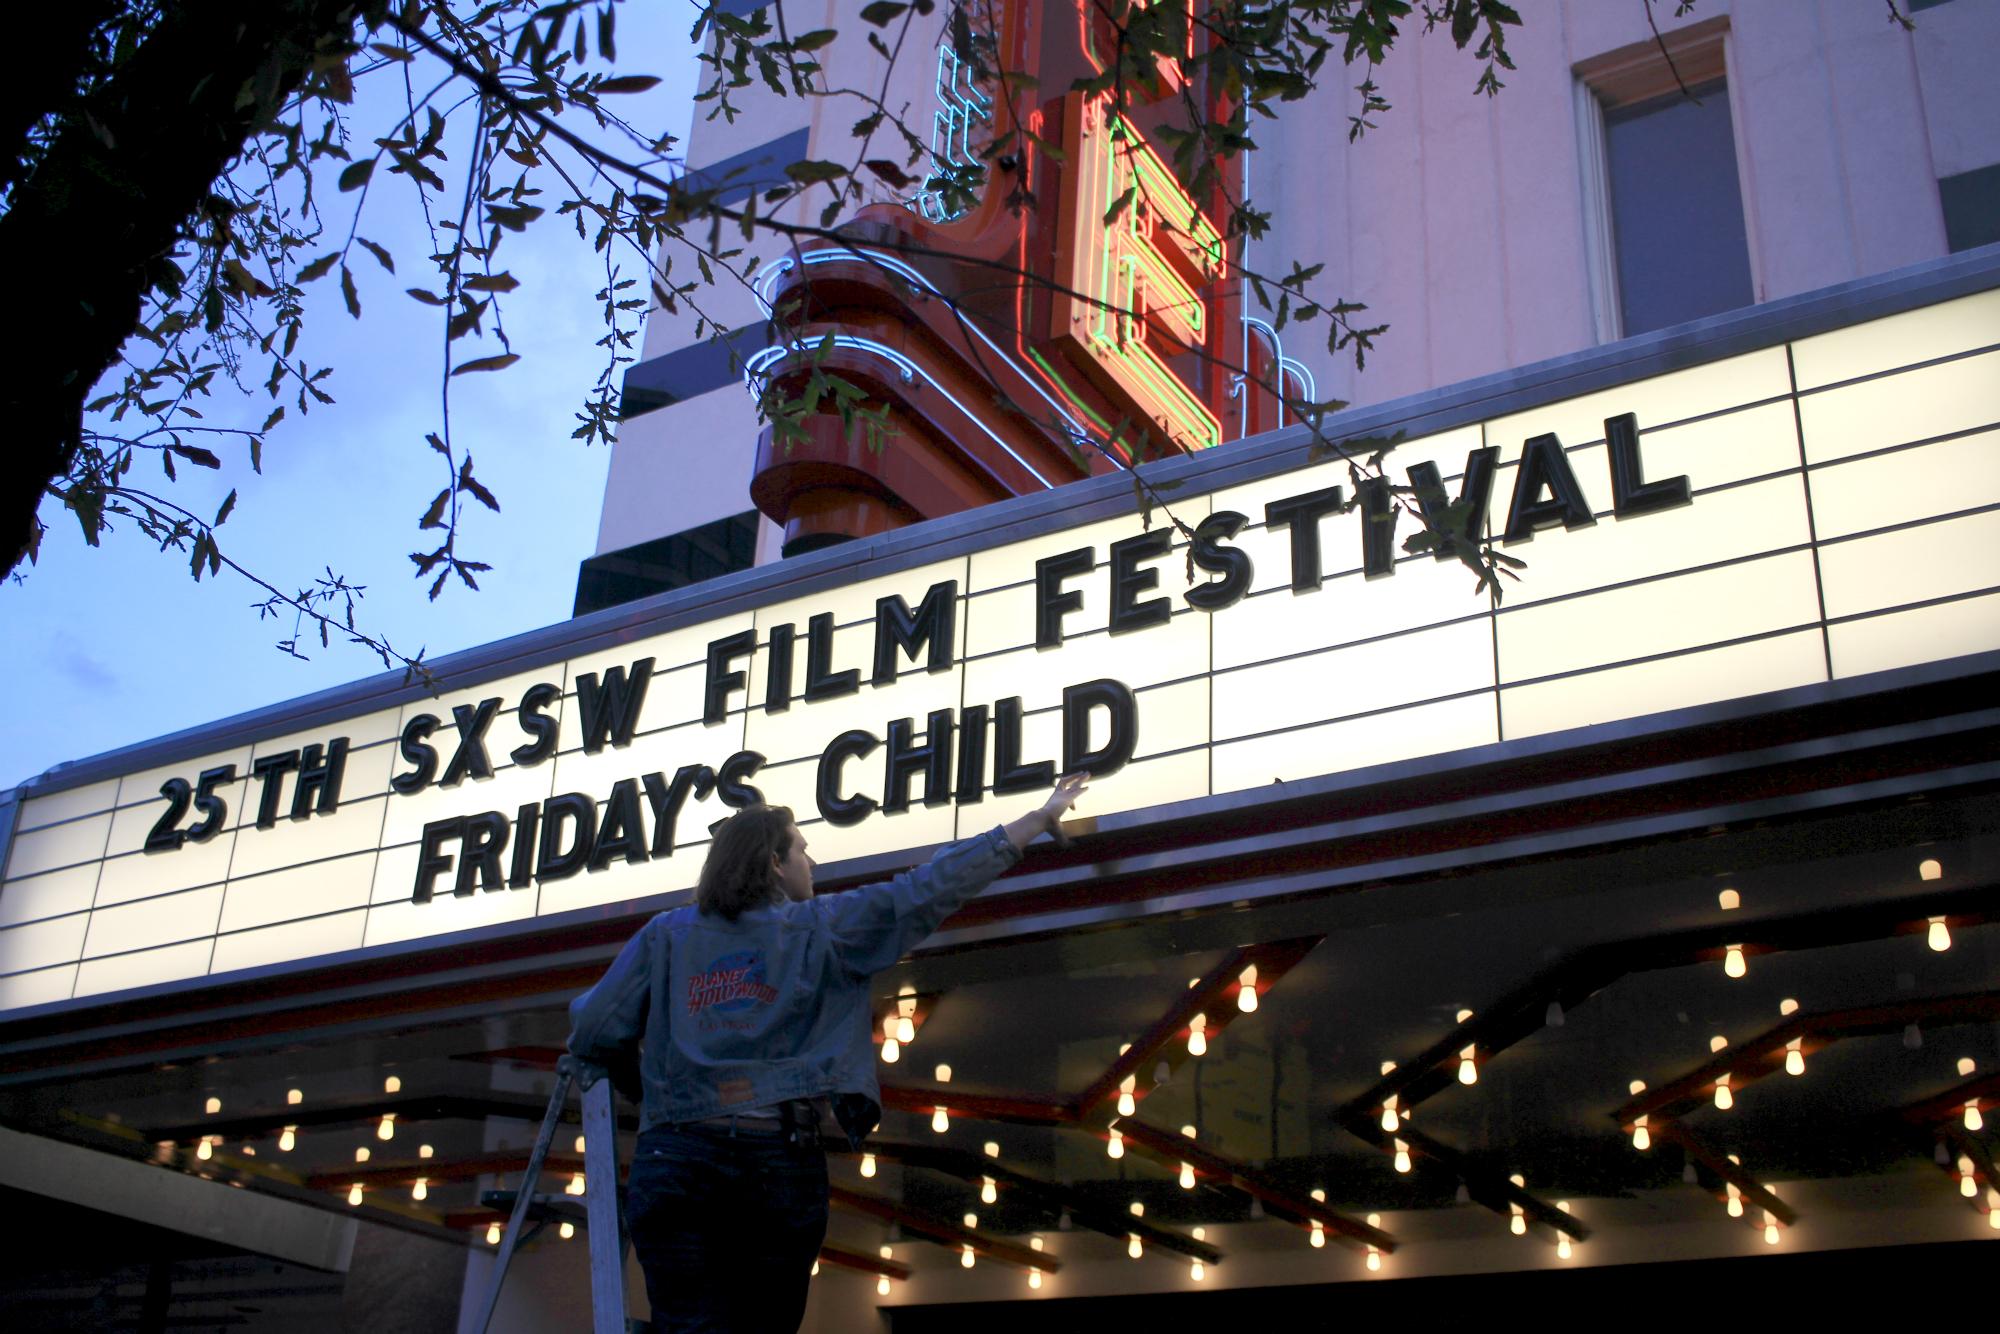 Friday's Child, photo by Heather Kaplan